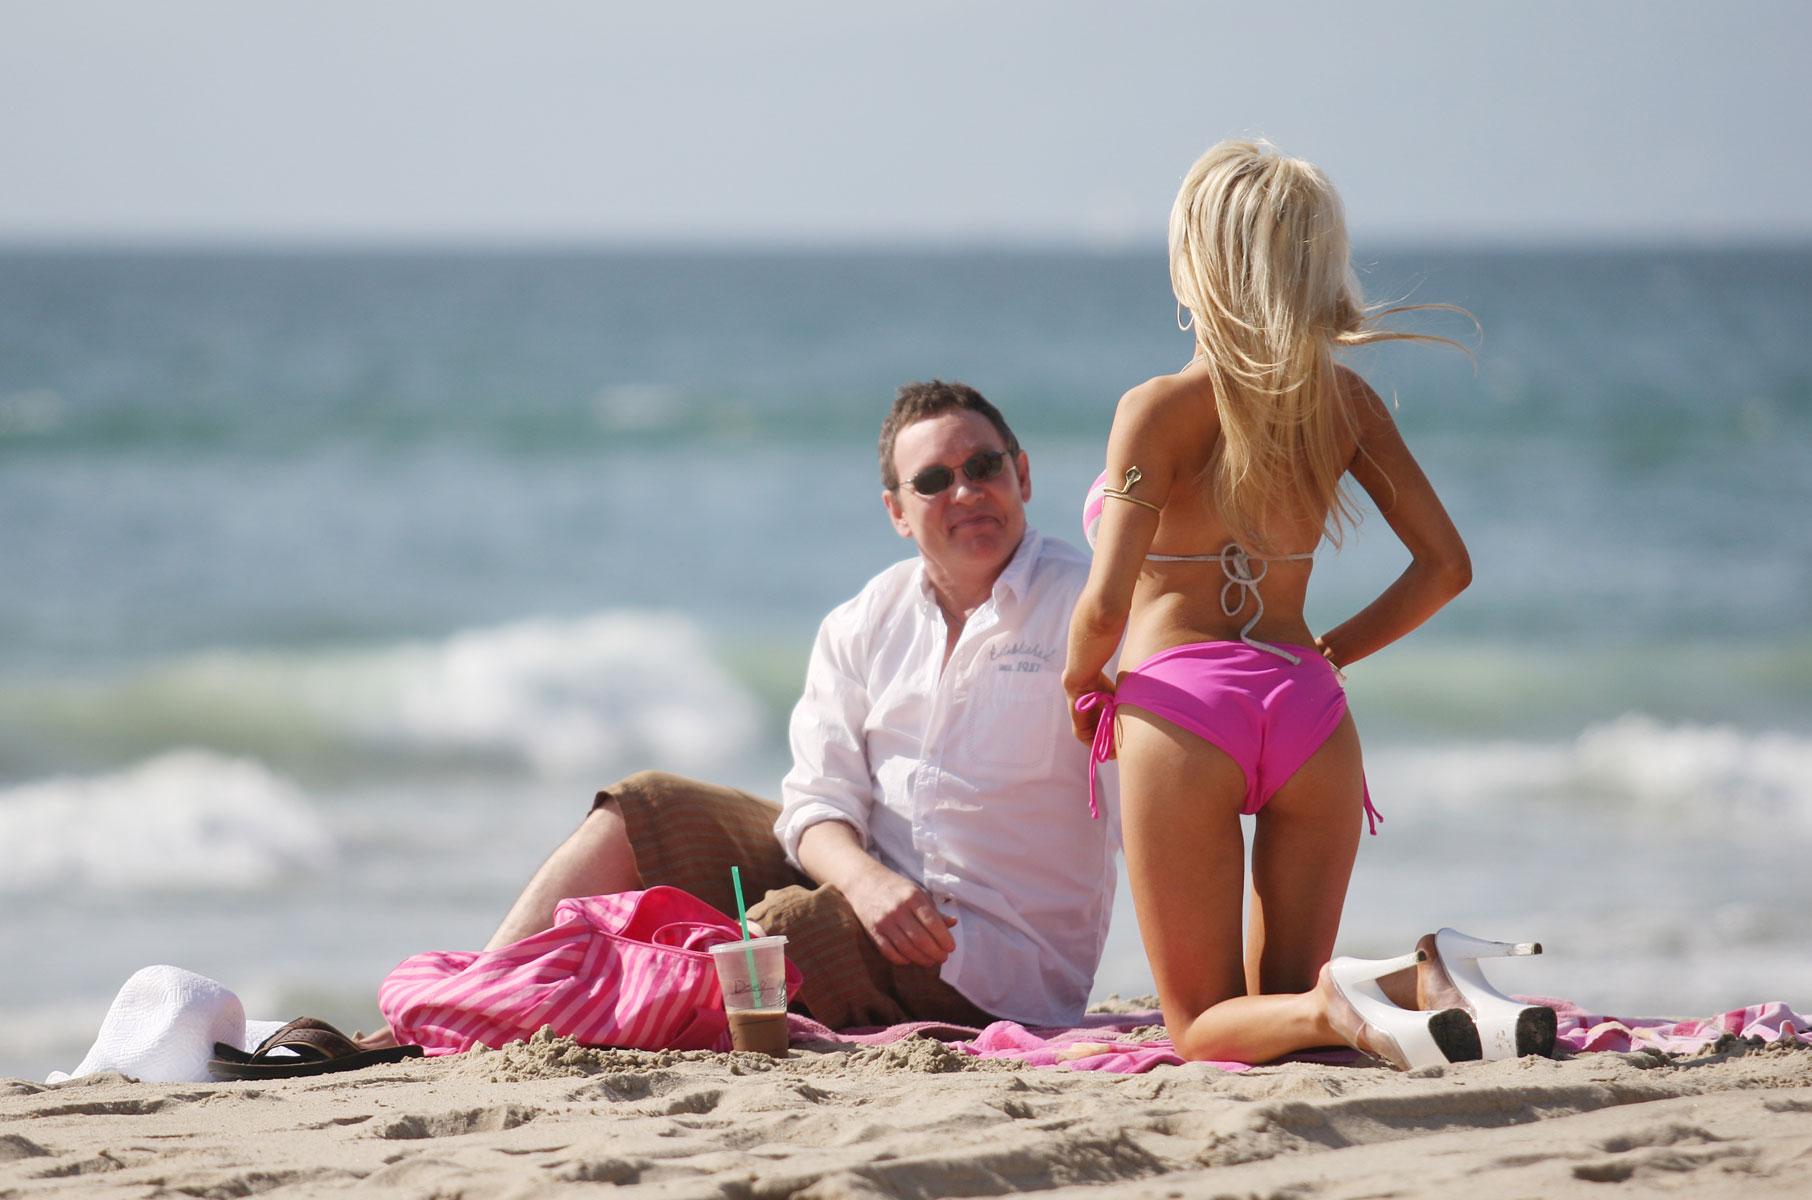 Courtney Stodden in Bikini on the beach in Malibu Pic 29 of 35